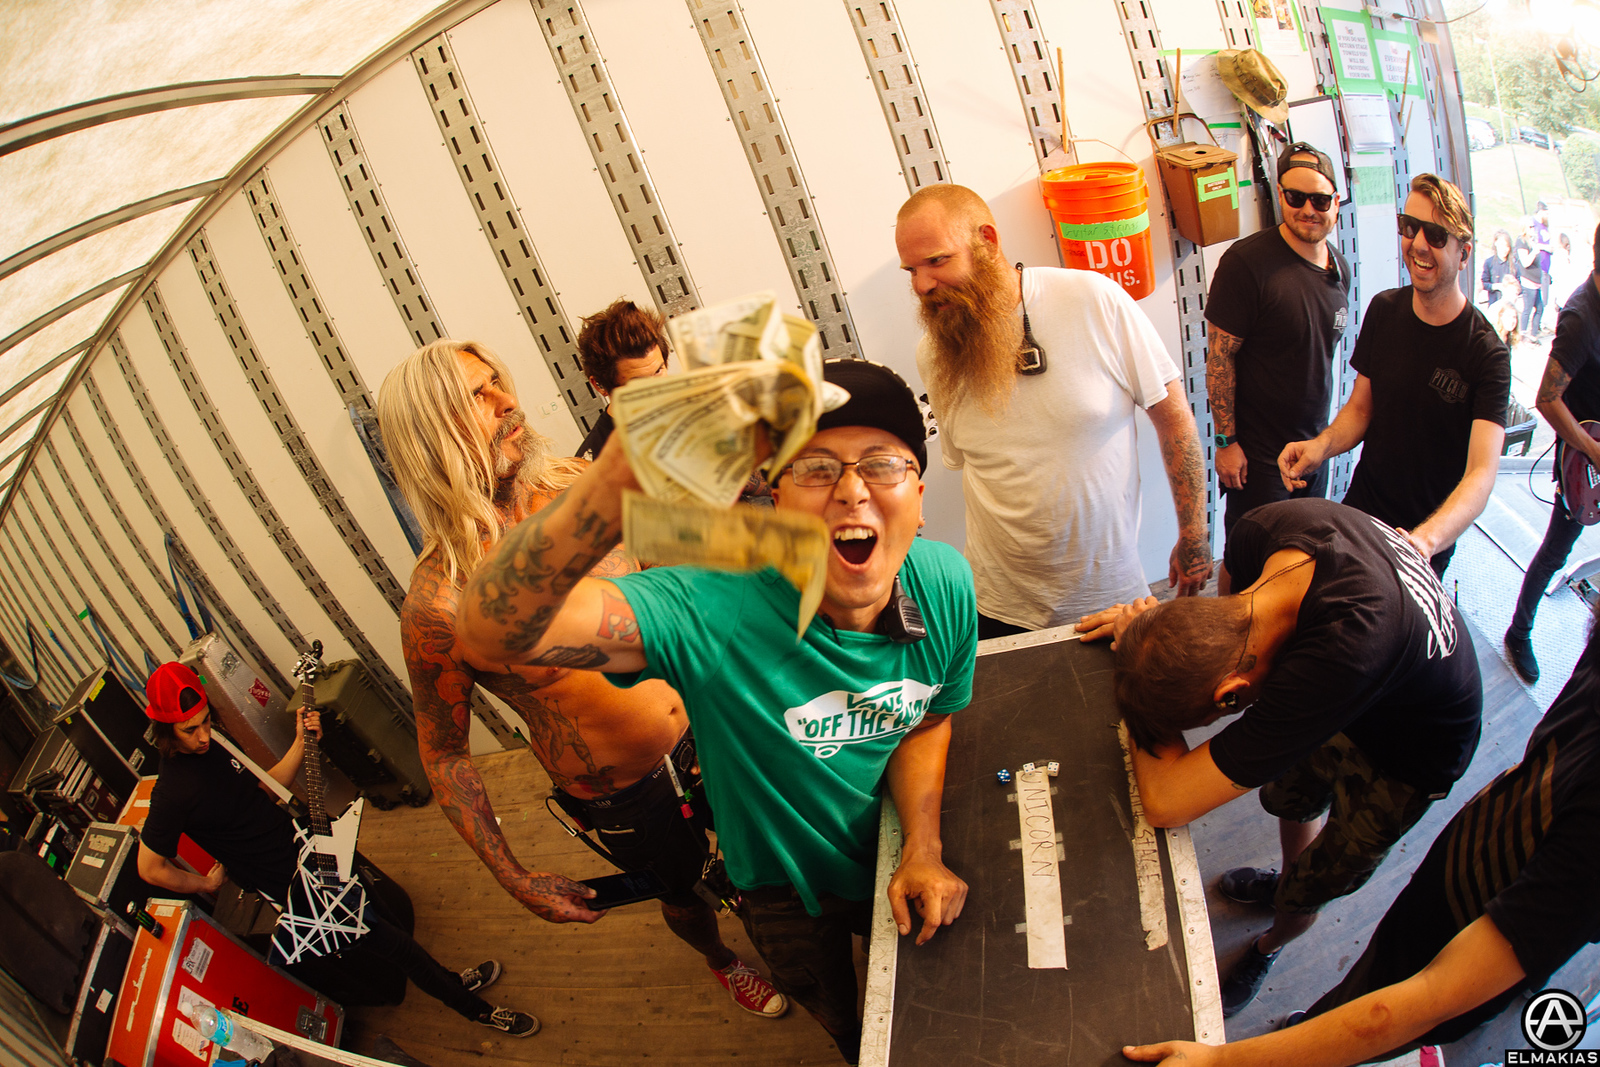 Unicorn Stage crew (NOT SURE) at Warped Tour 2015 by Adam Elmakias